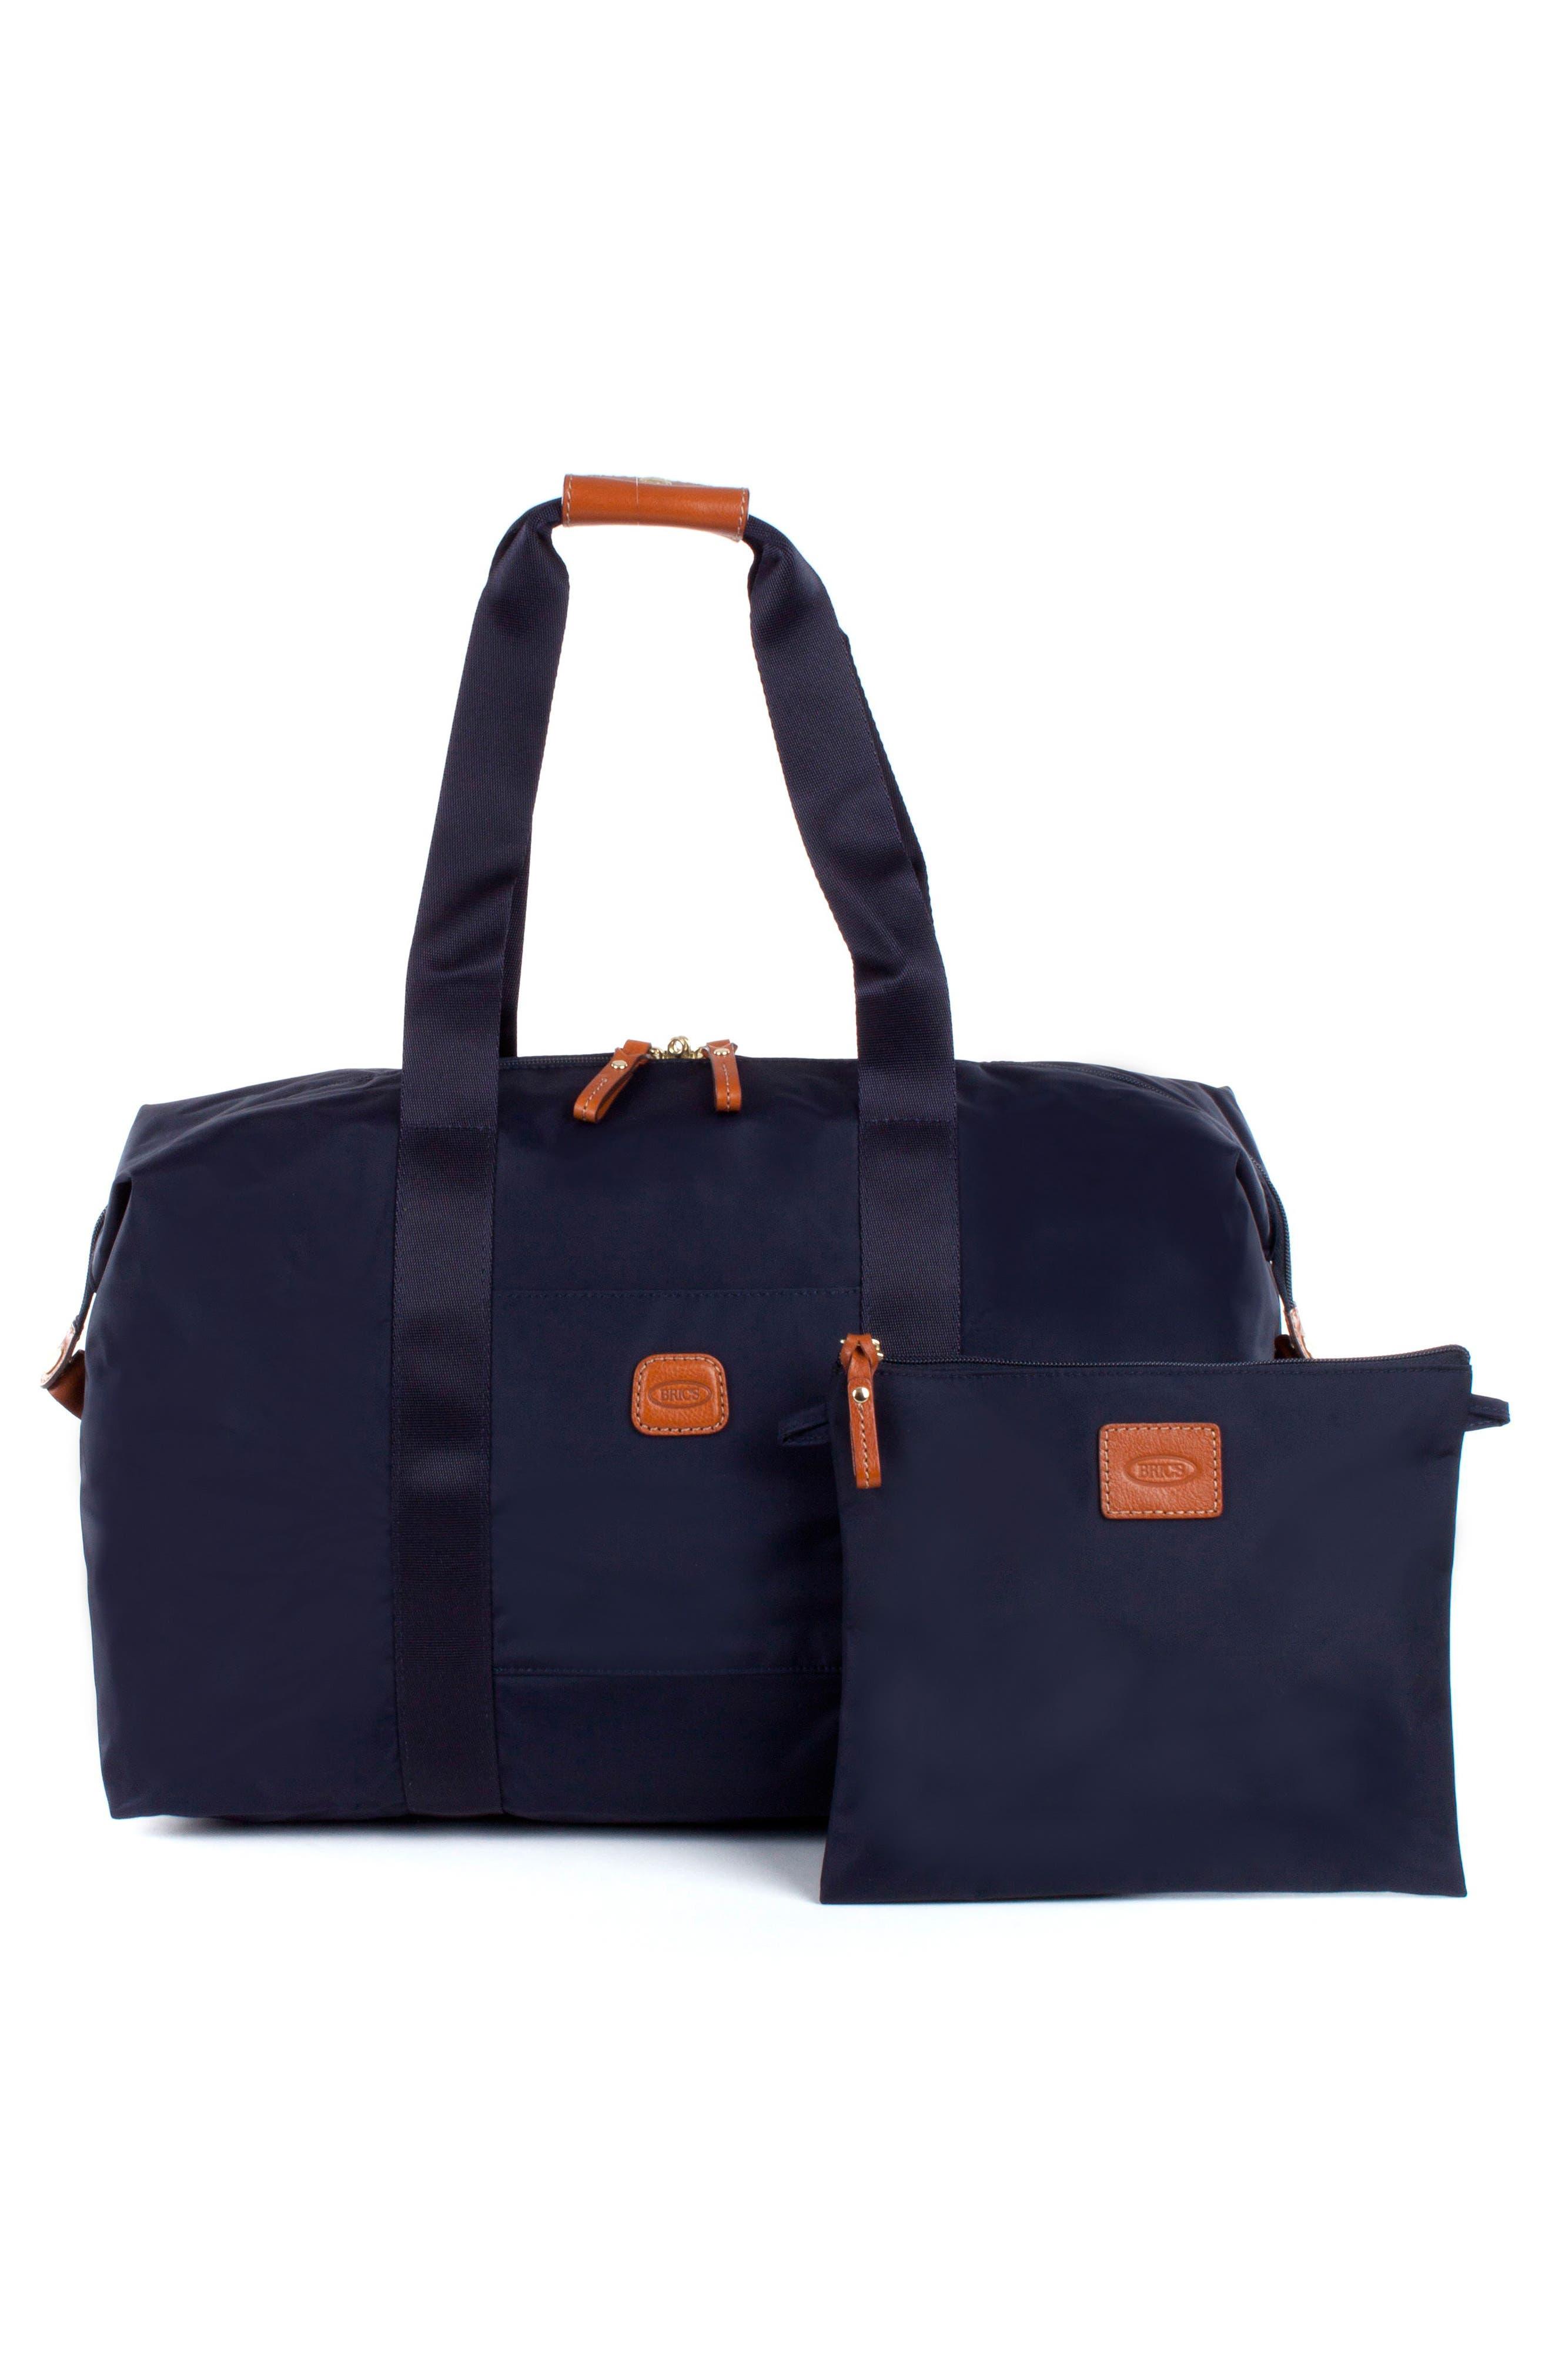 'X-Bag' Folding Duffel Bag,                             Alternate thumbnail 4, color,                             410